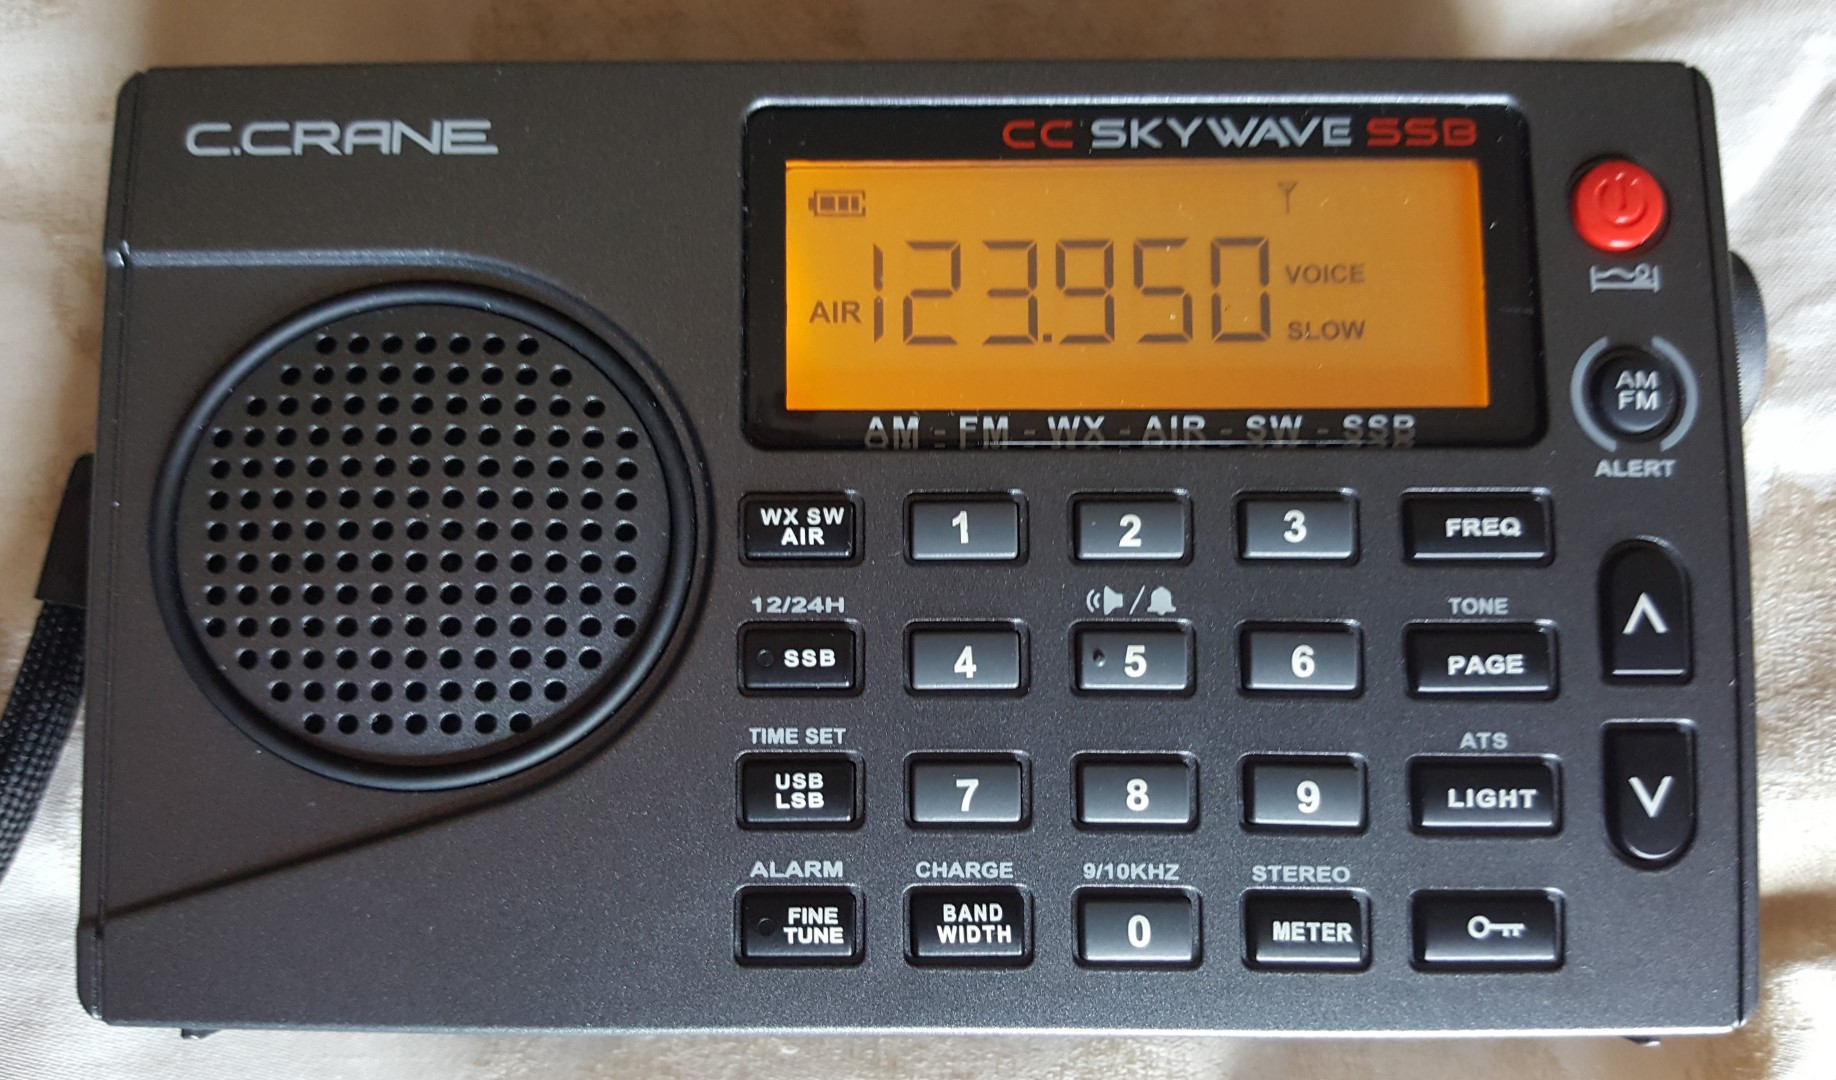 C Crane Cc Skywave Ssb Radio Radiojayallen